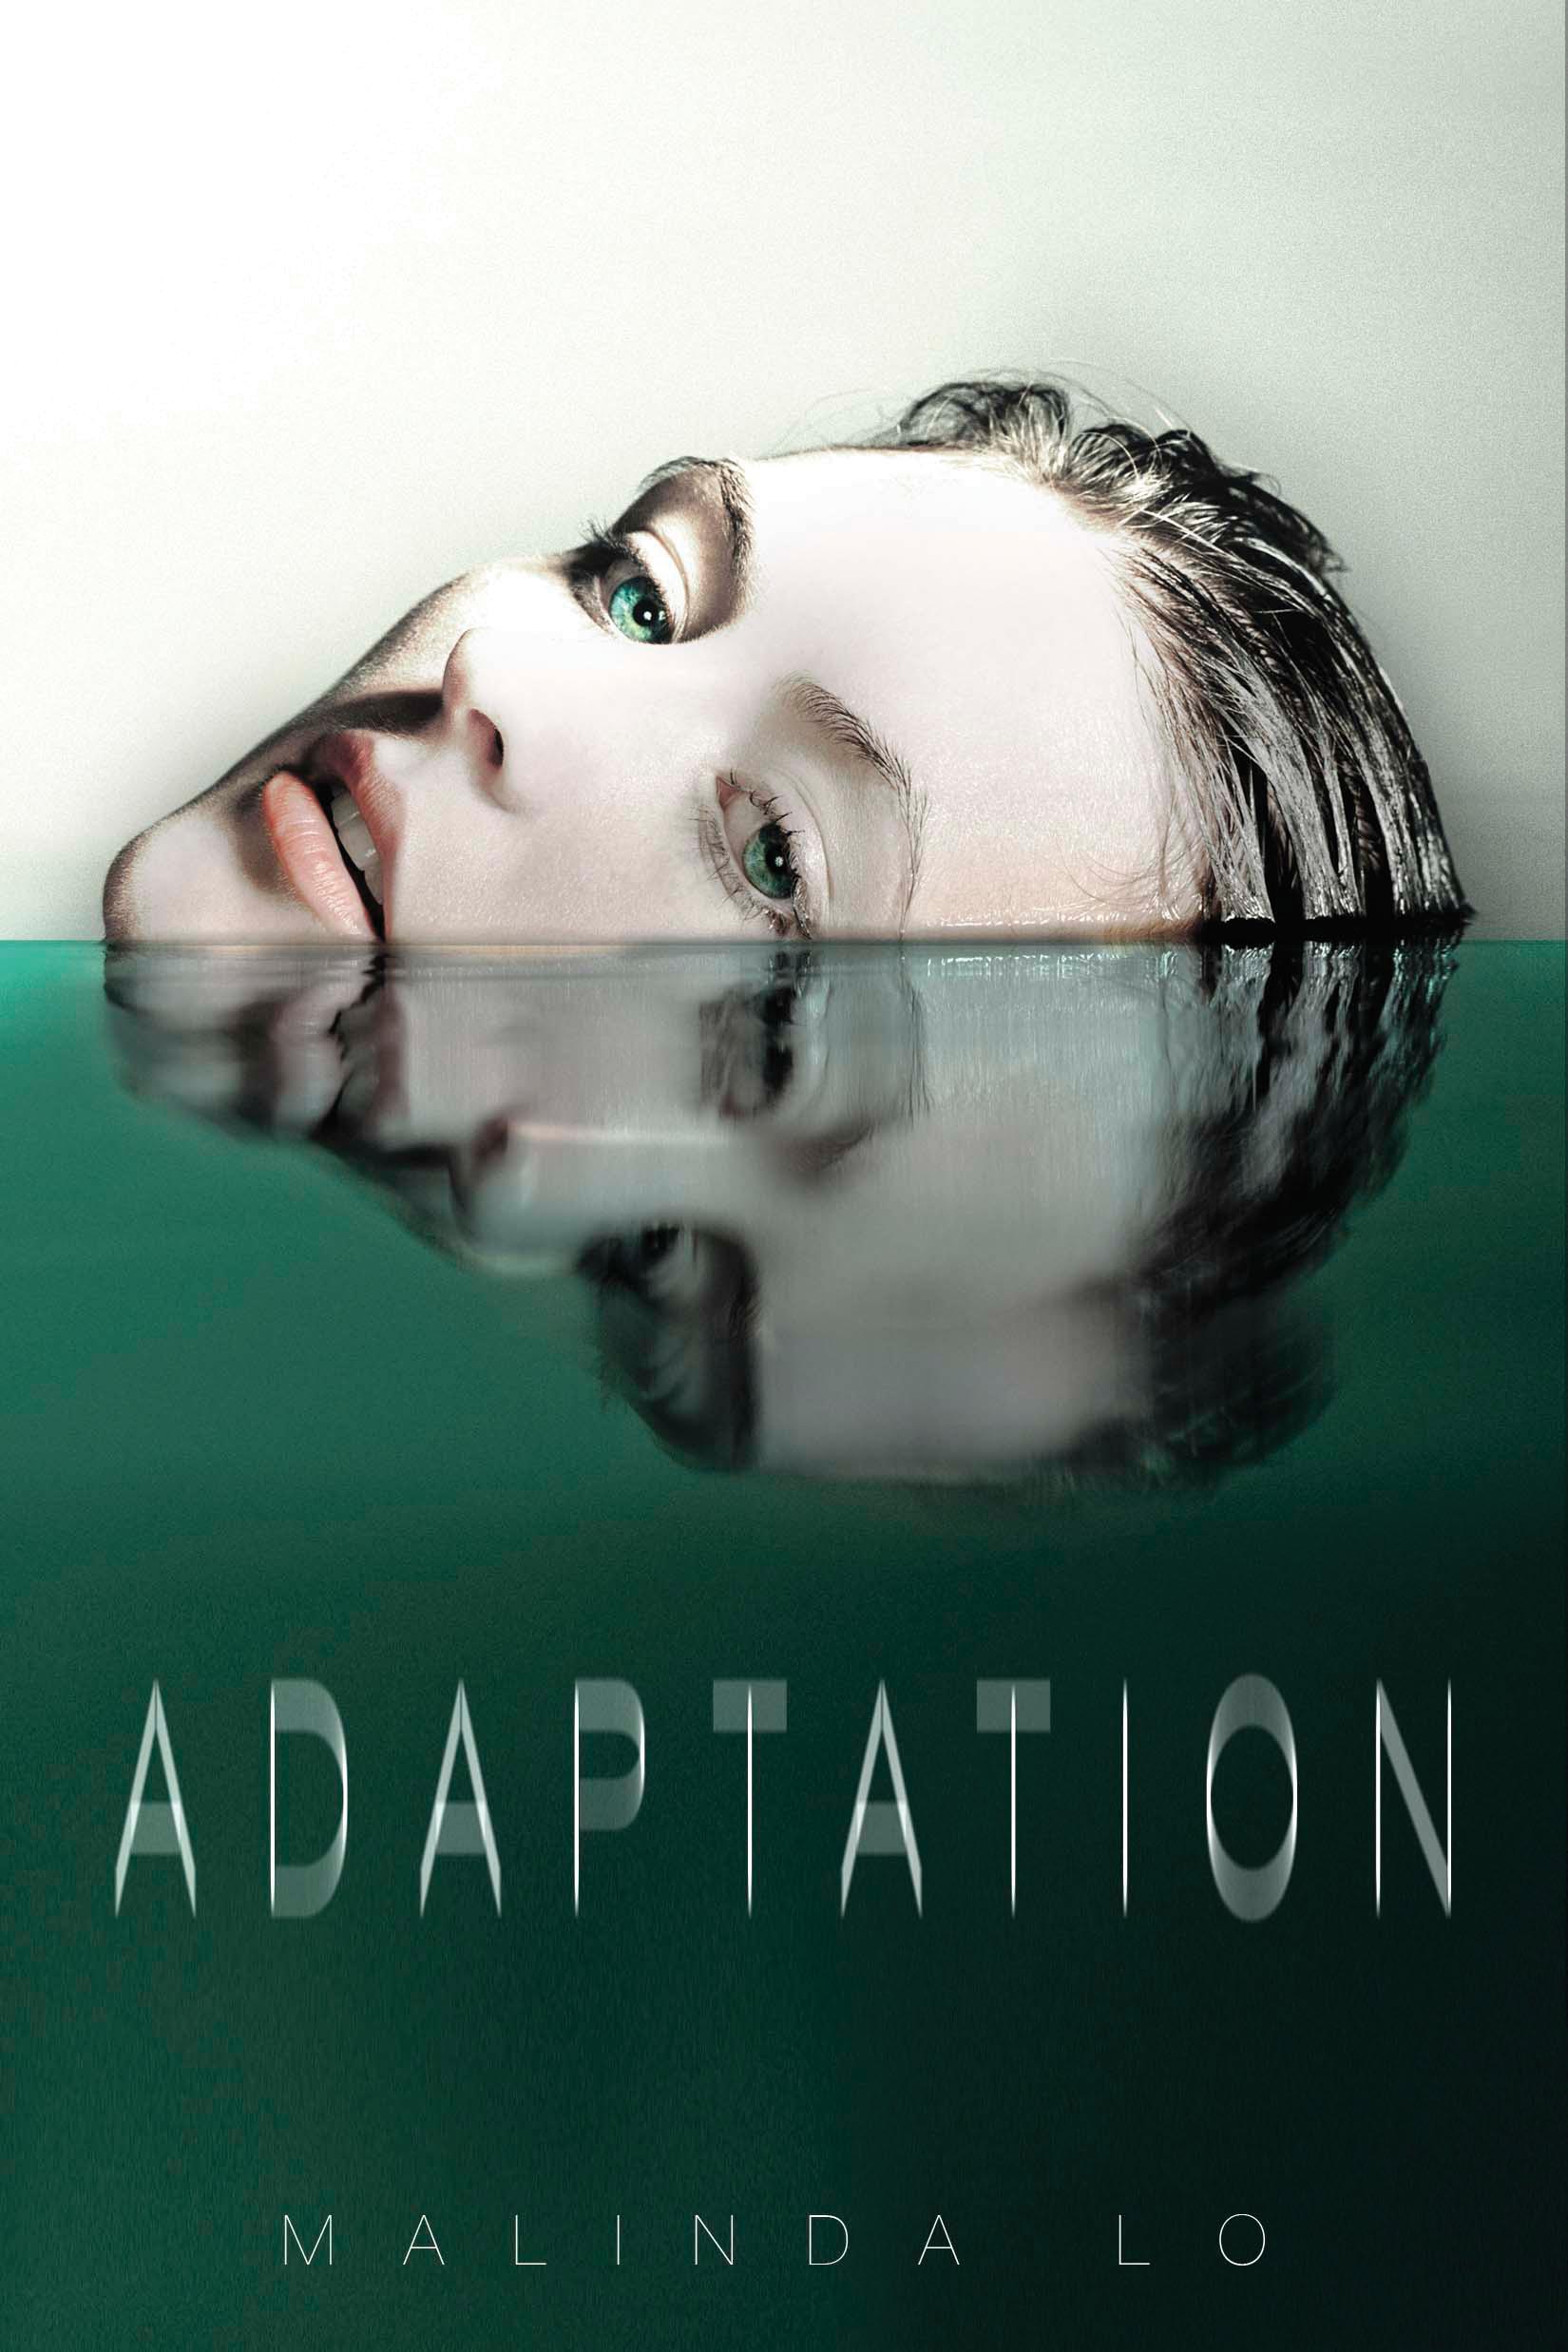 malinda-lo-adaptation.jpg